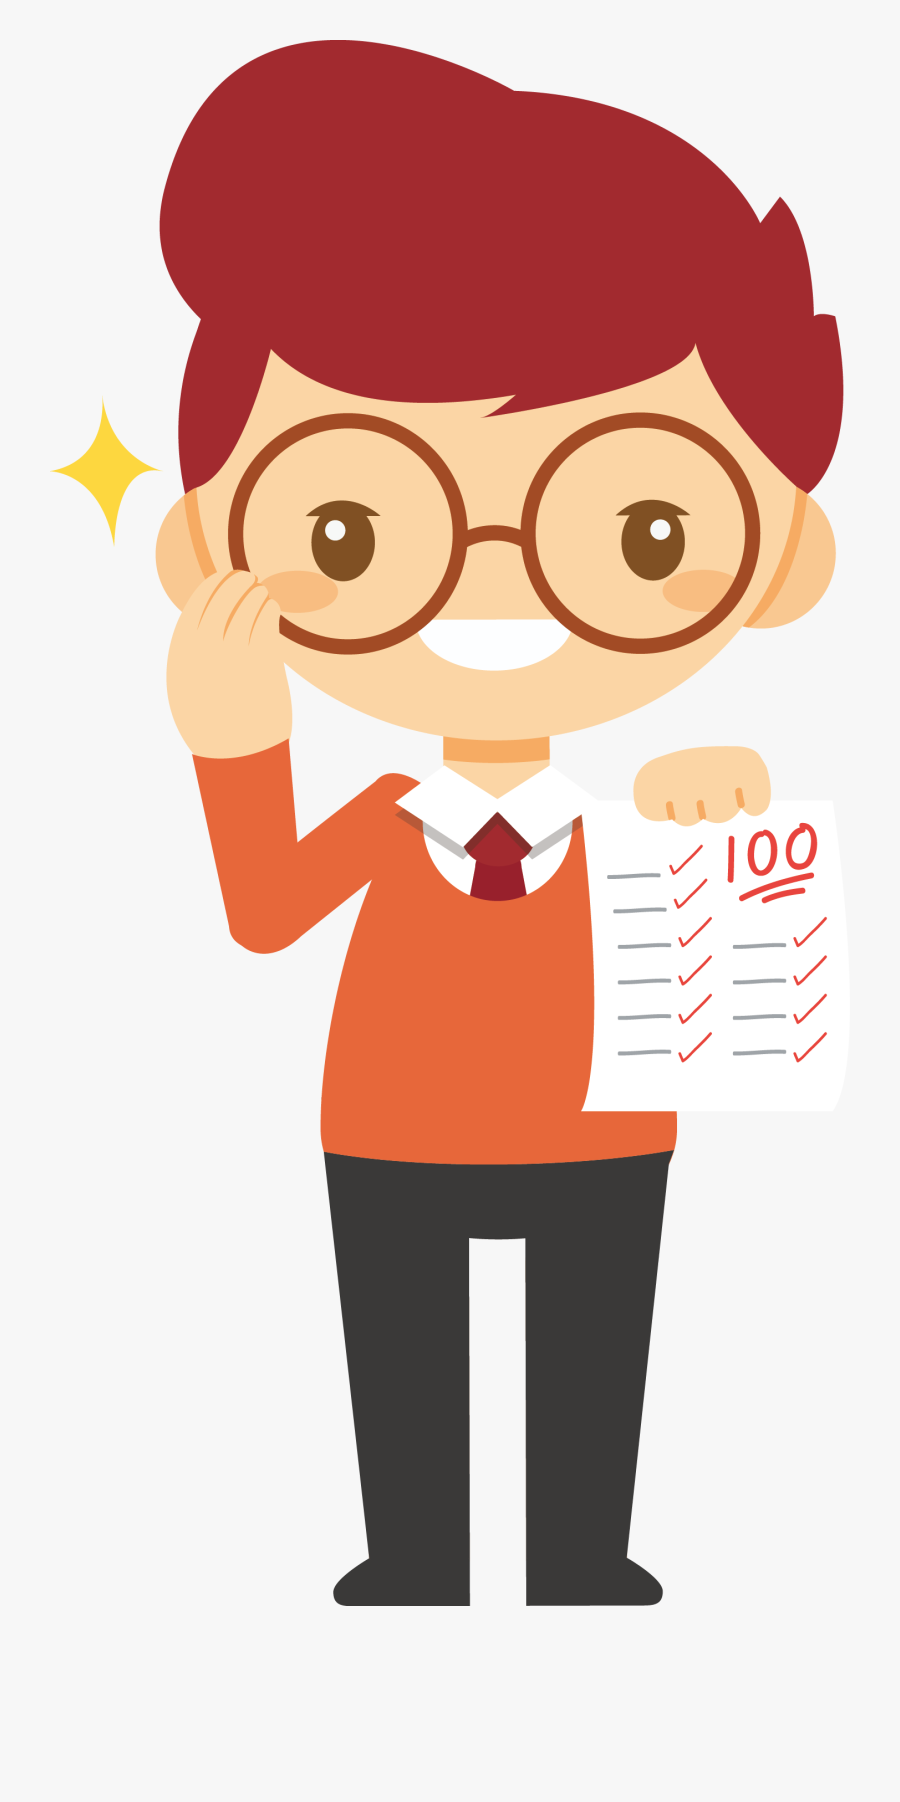 Adobe Illustrator Education Illustration - Cartoon Characters In Illustrator, Transparent Clipart